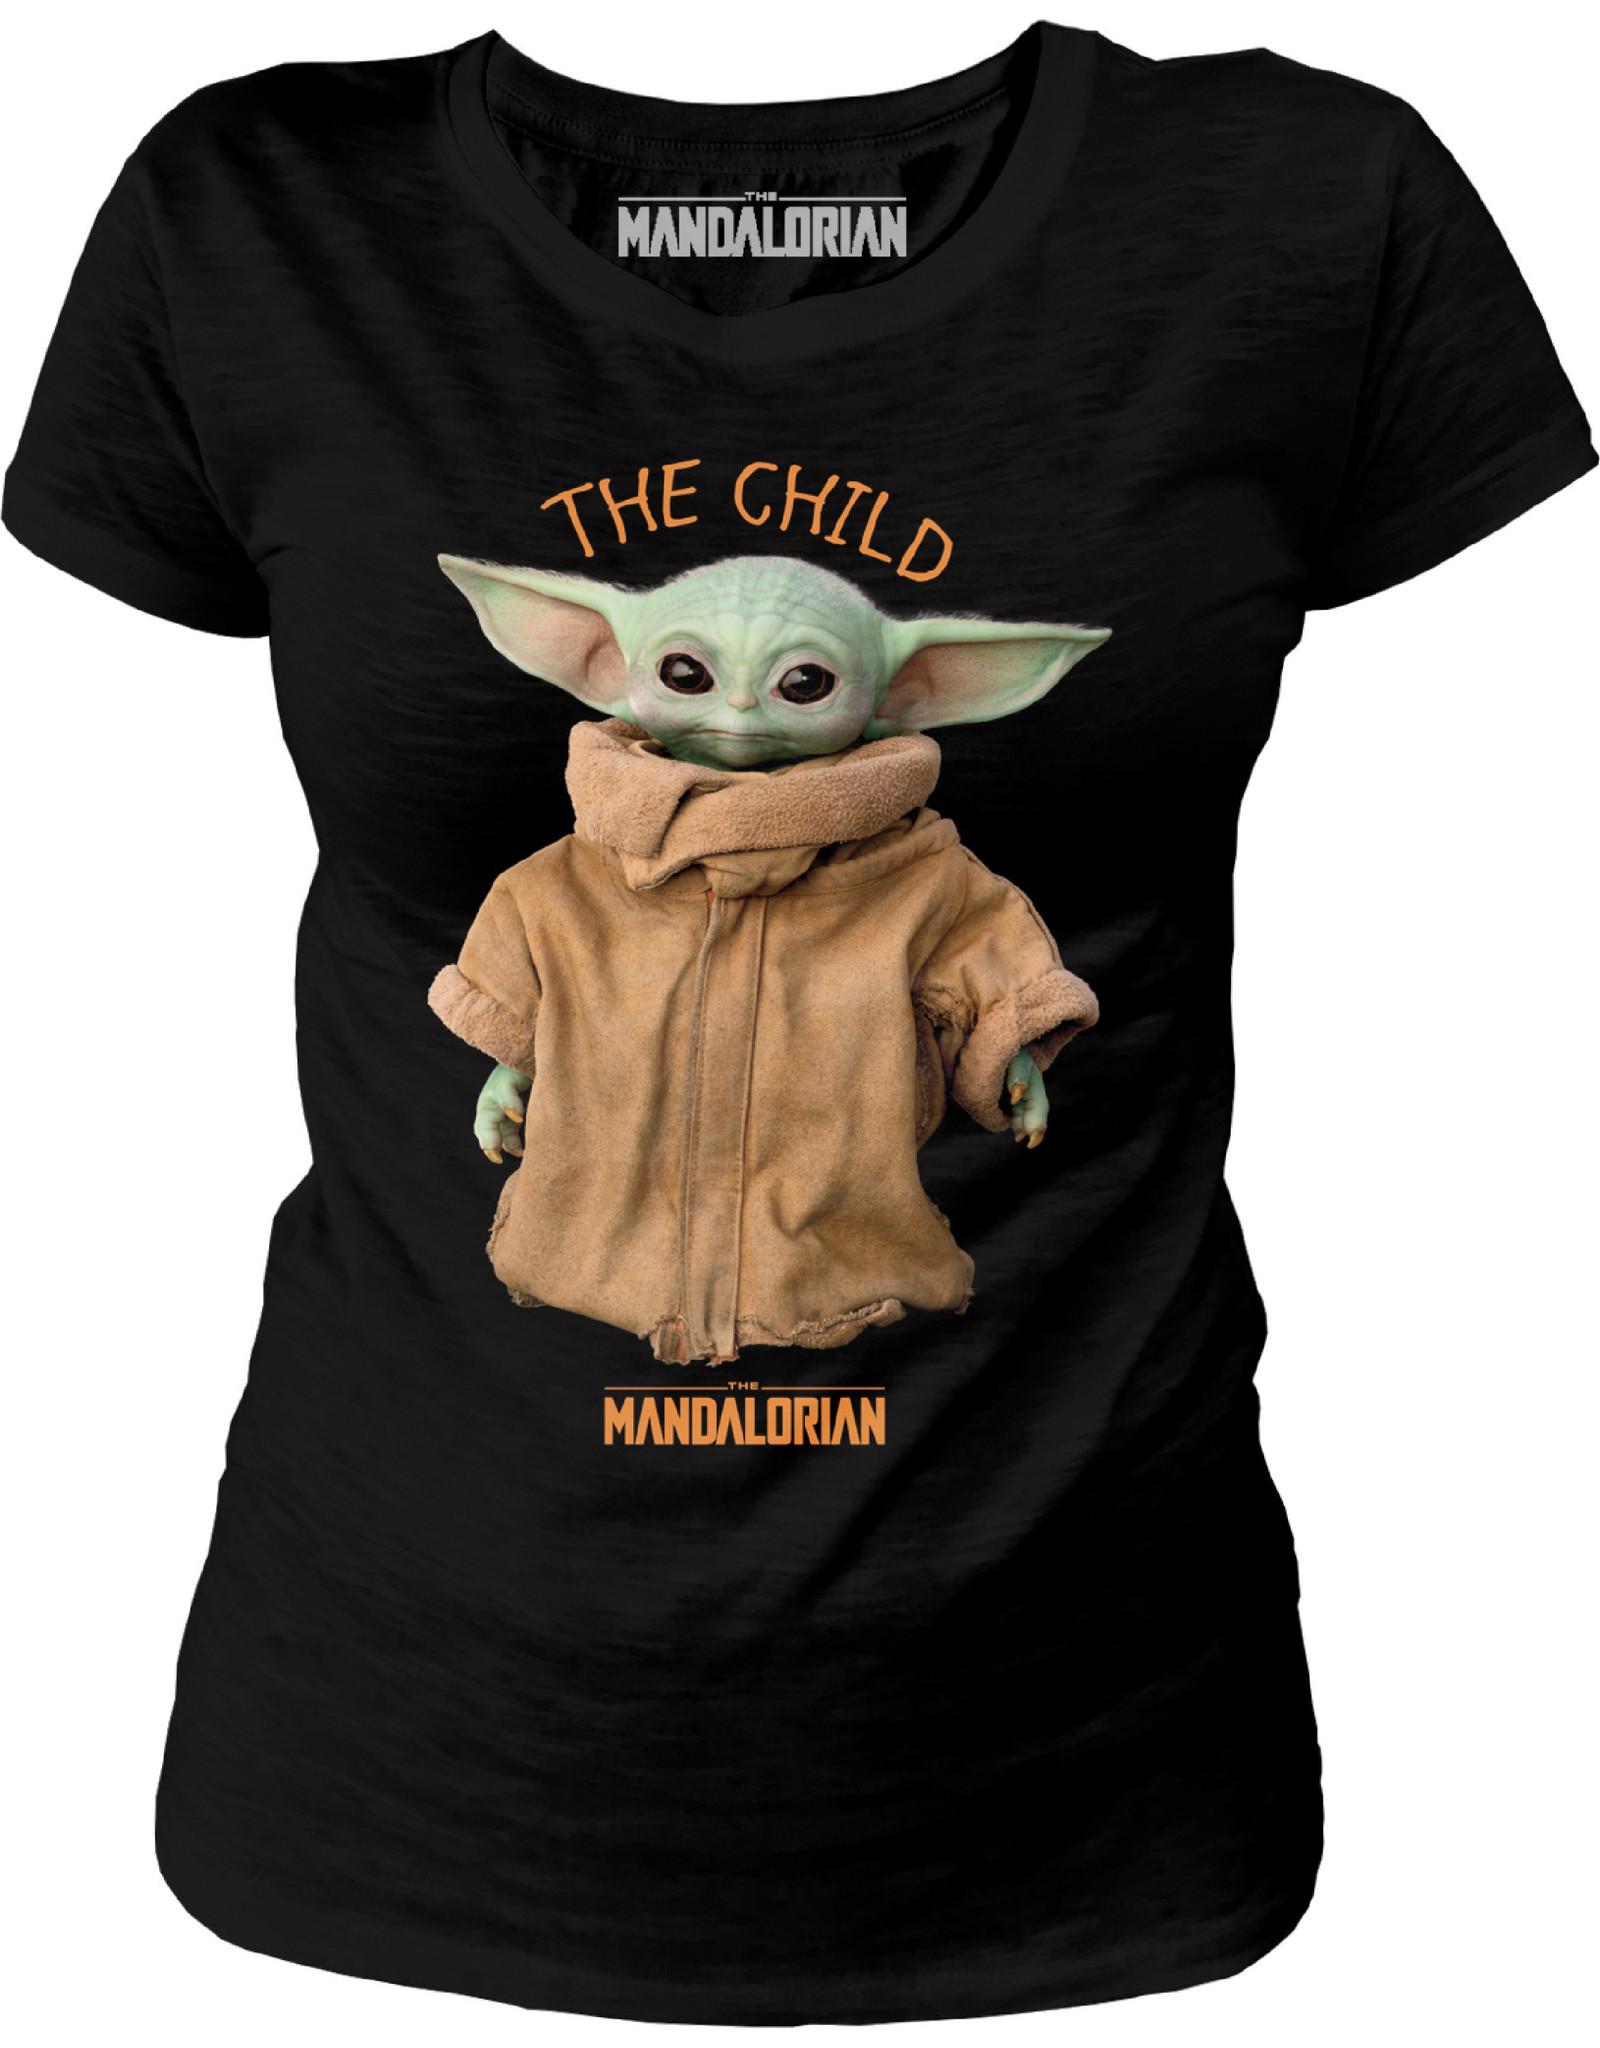 MANDALORIAN T-Shirt Girl (M) - The Child So Small